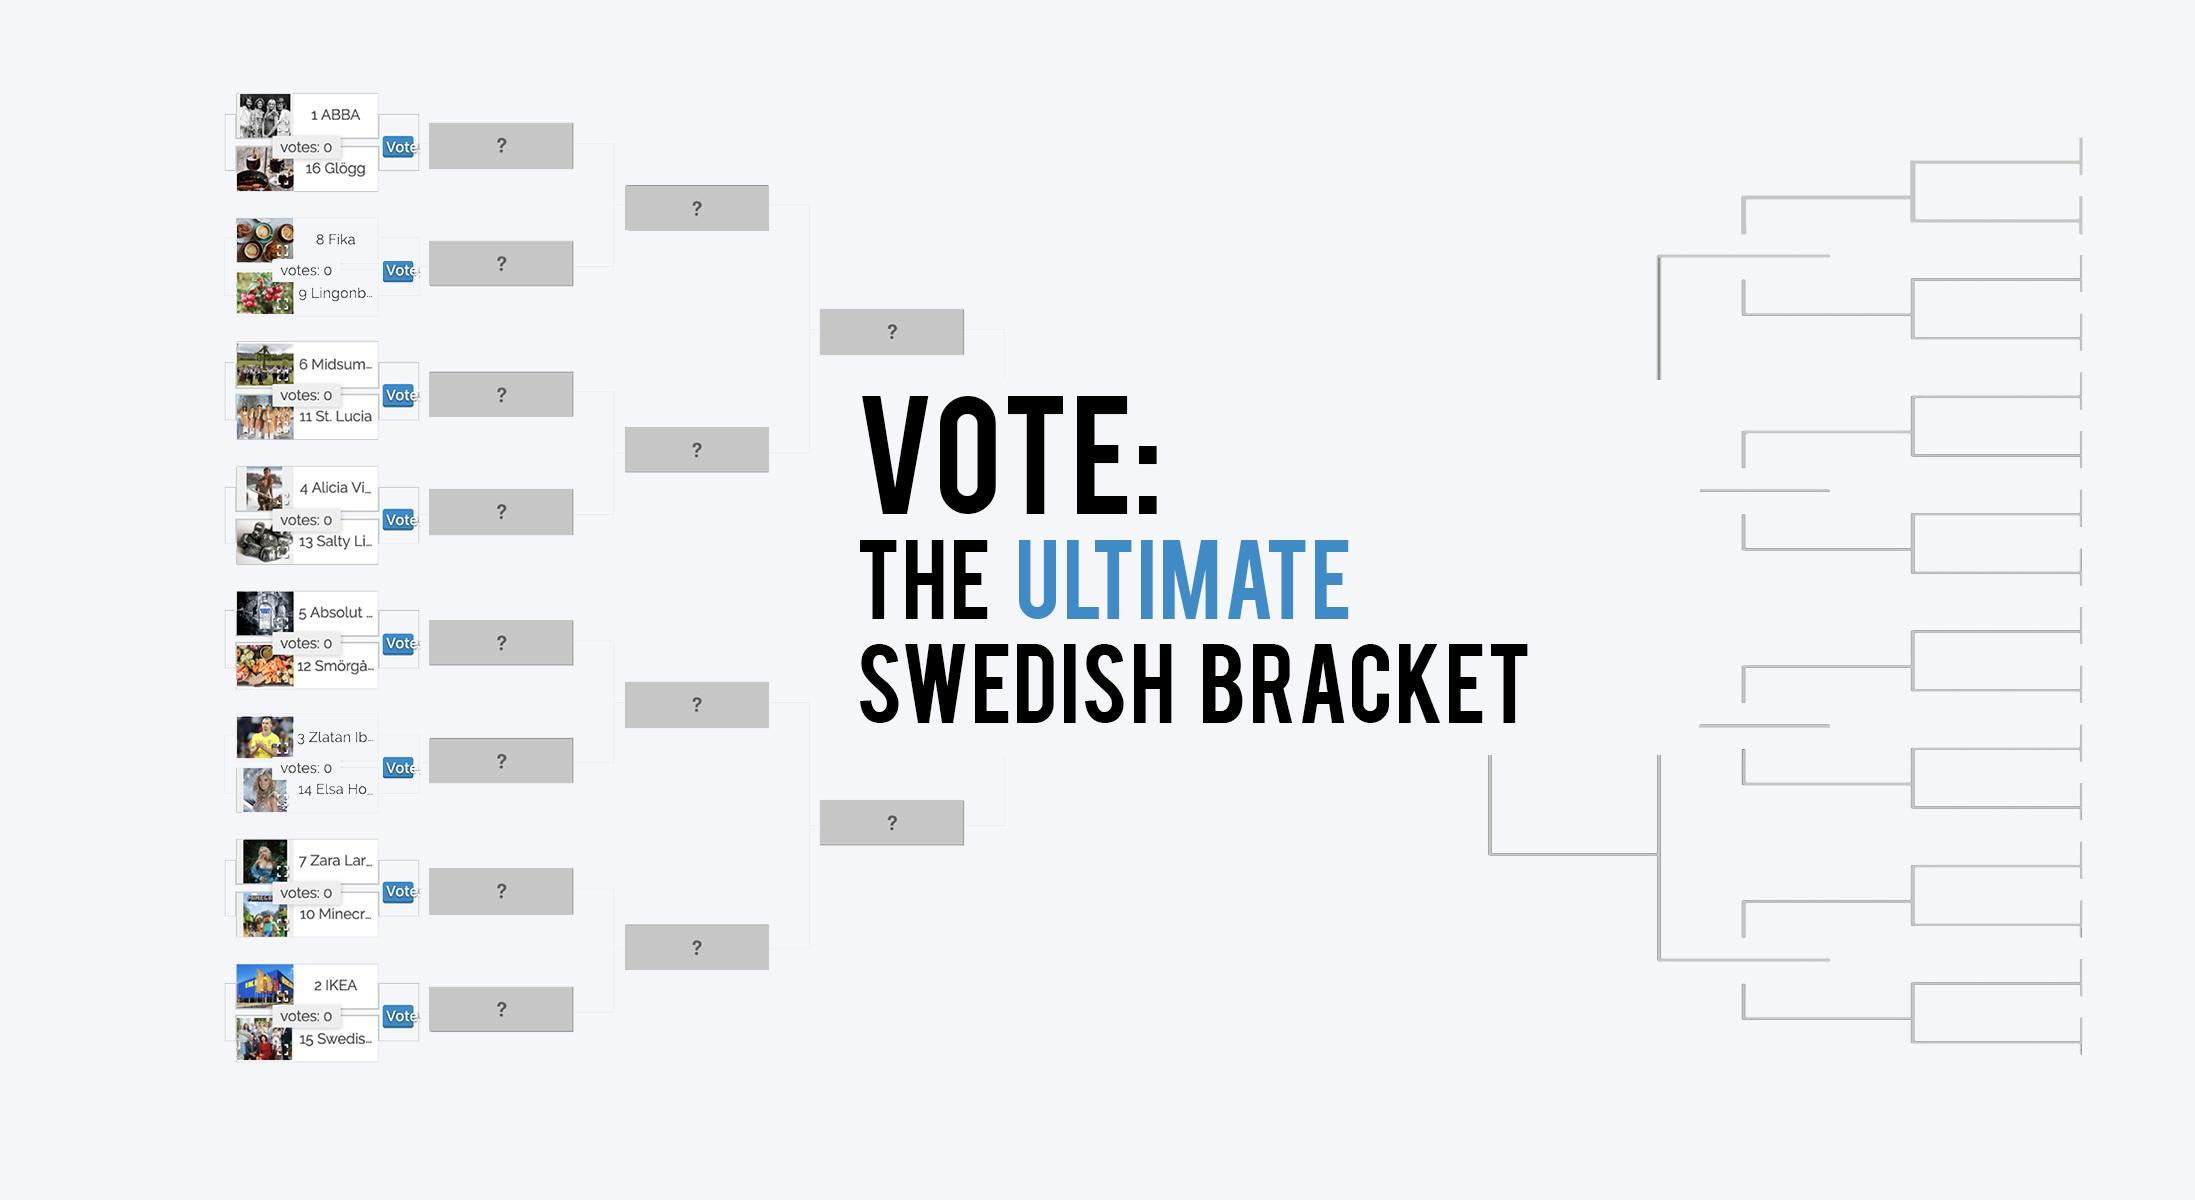 The Final Two Of The Ultimate Swedish Bracket Dala Horse Vs Fika